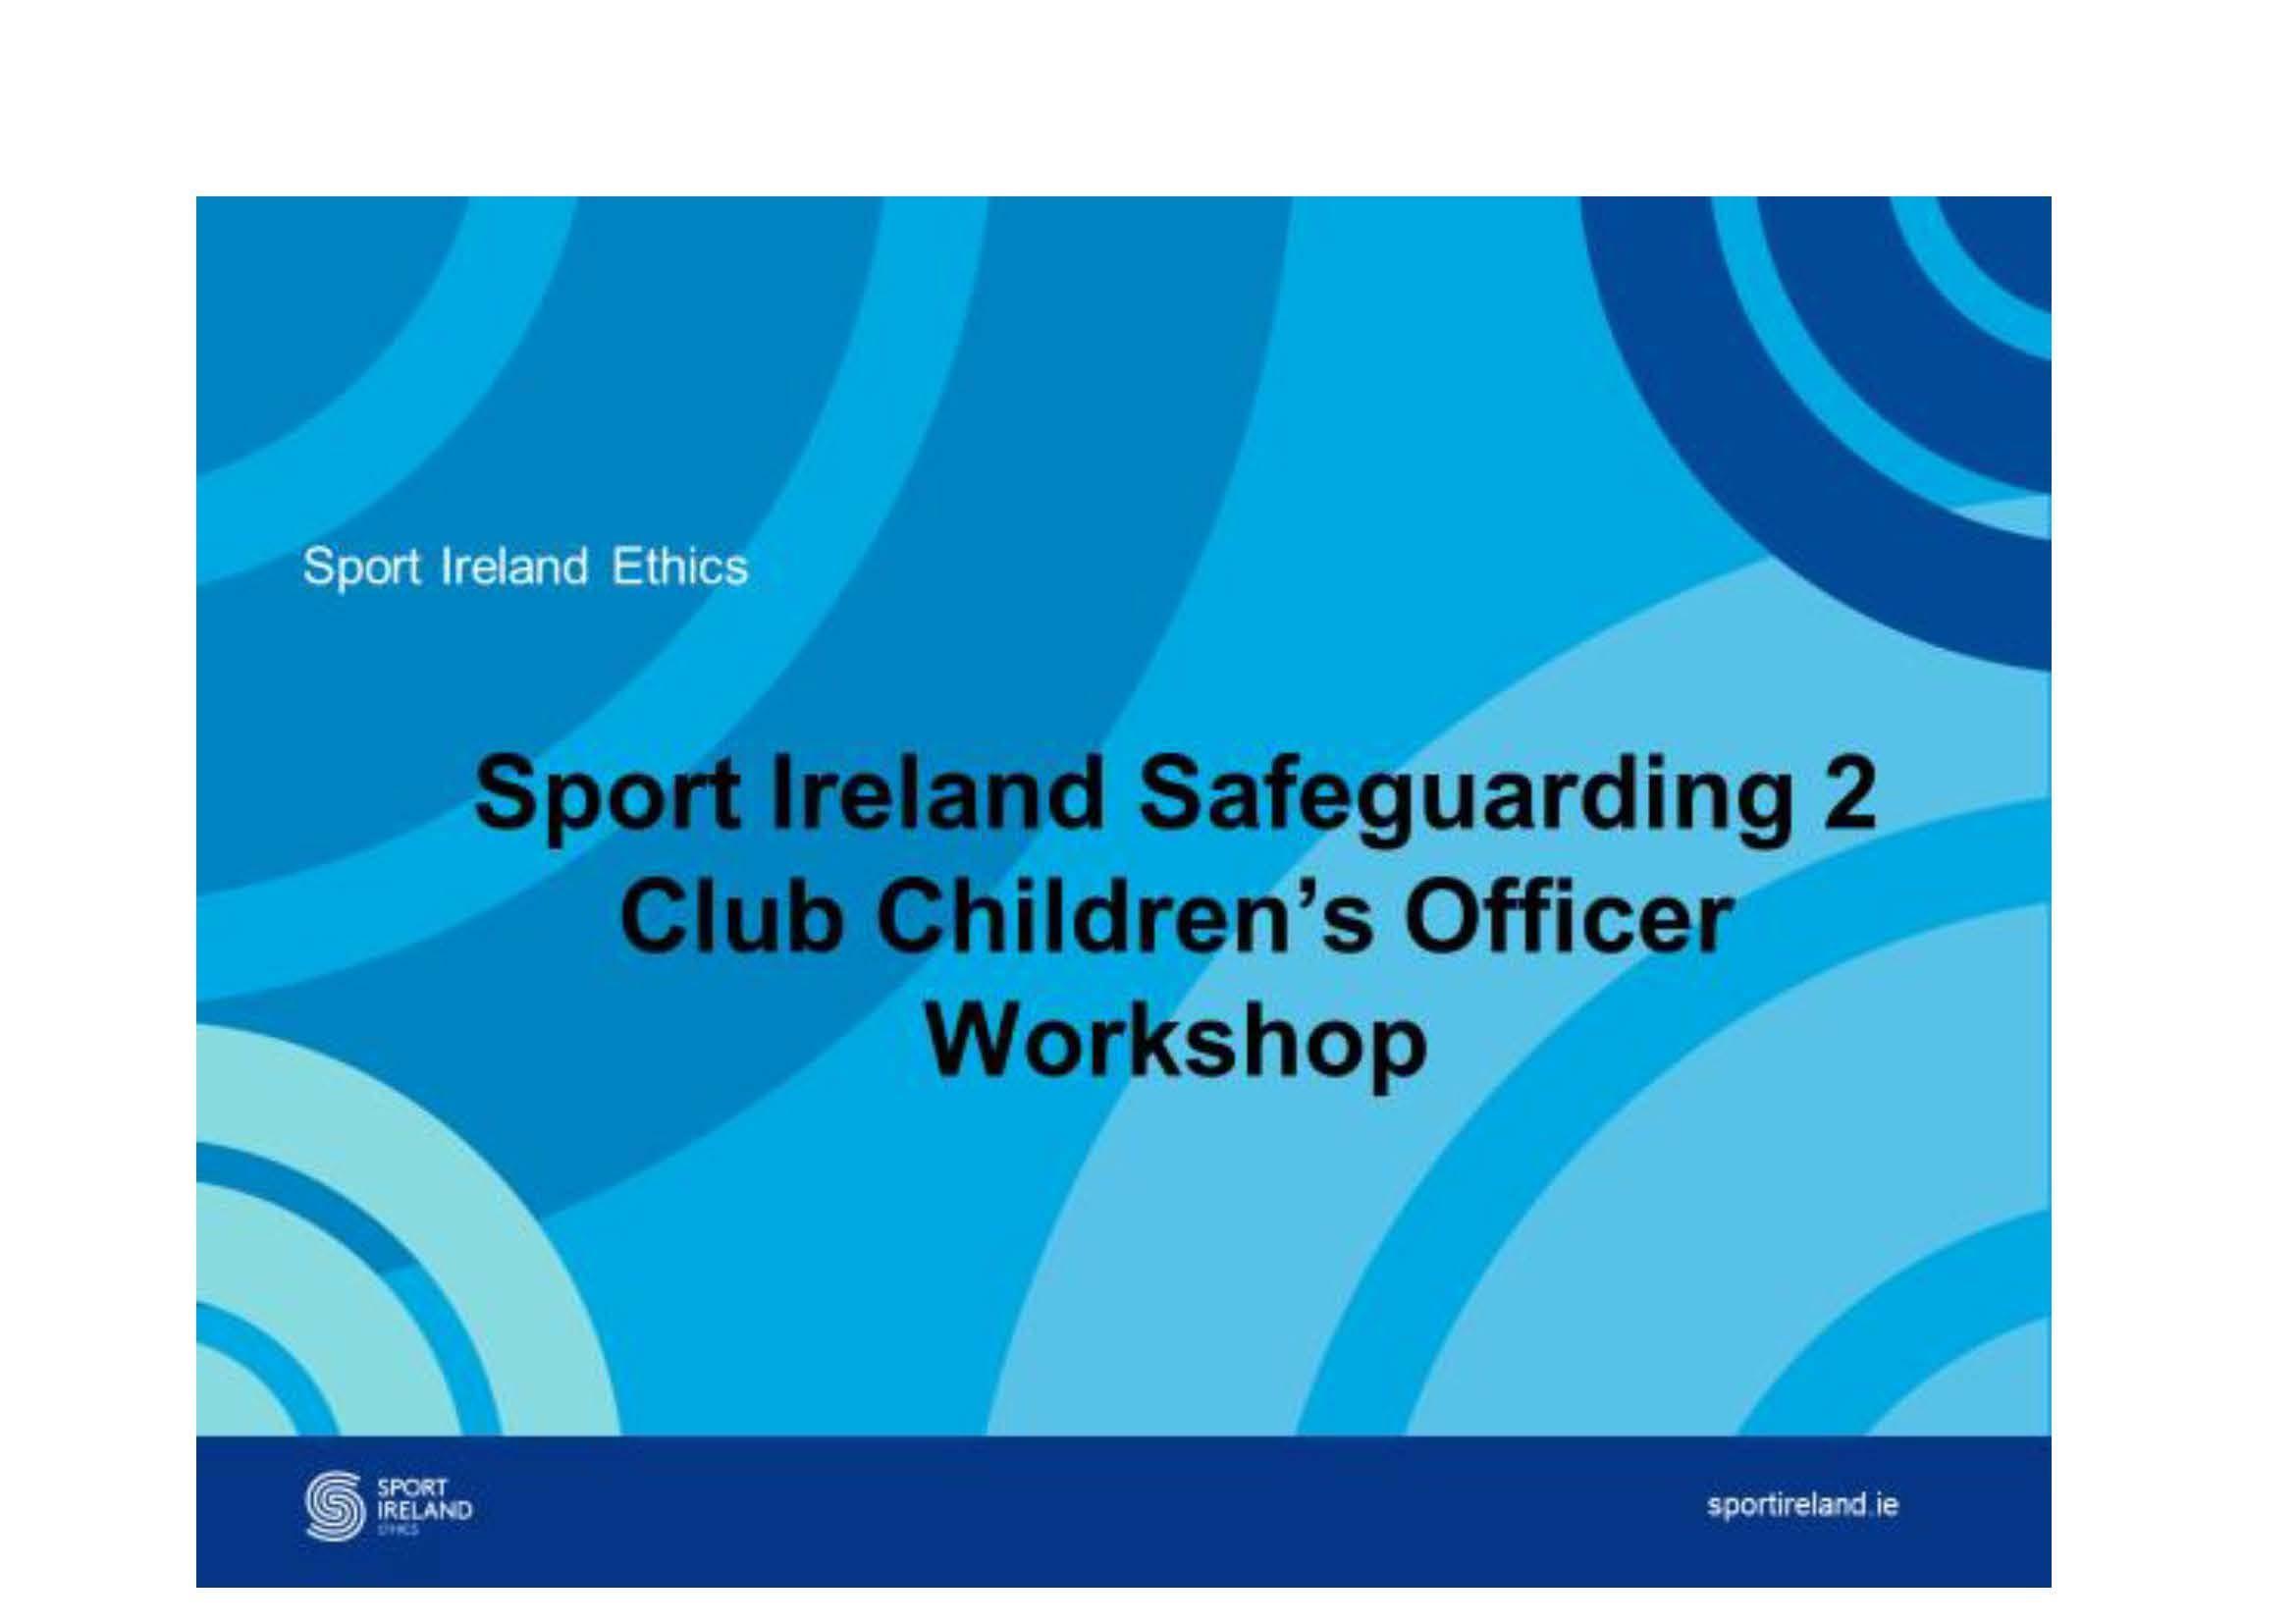 Safeguarding 2, Club Children's Officer Training, 02.05.19